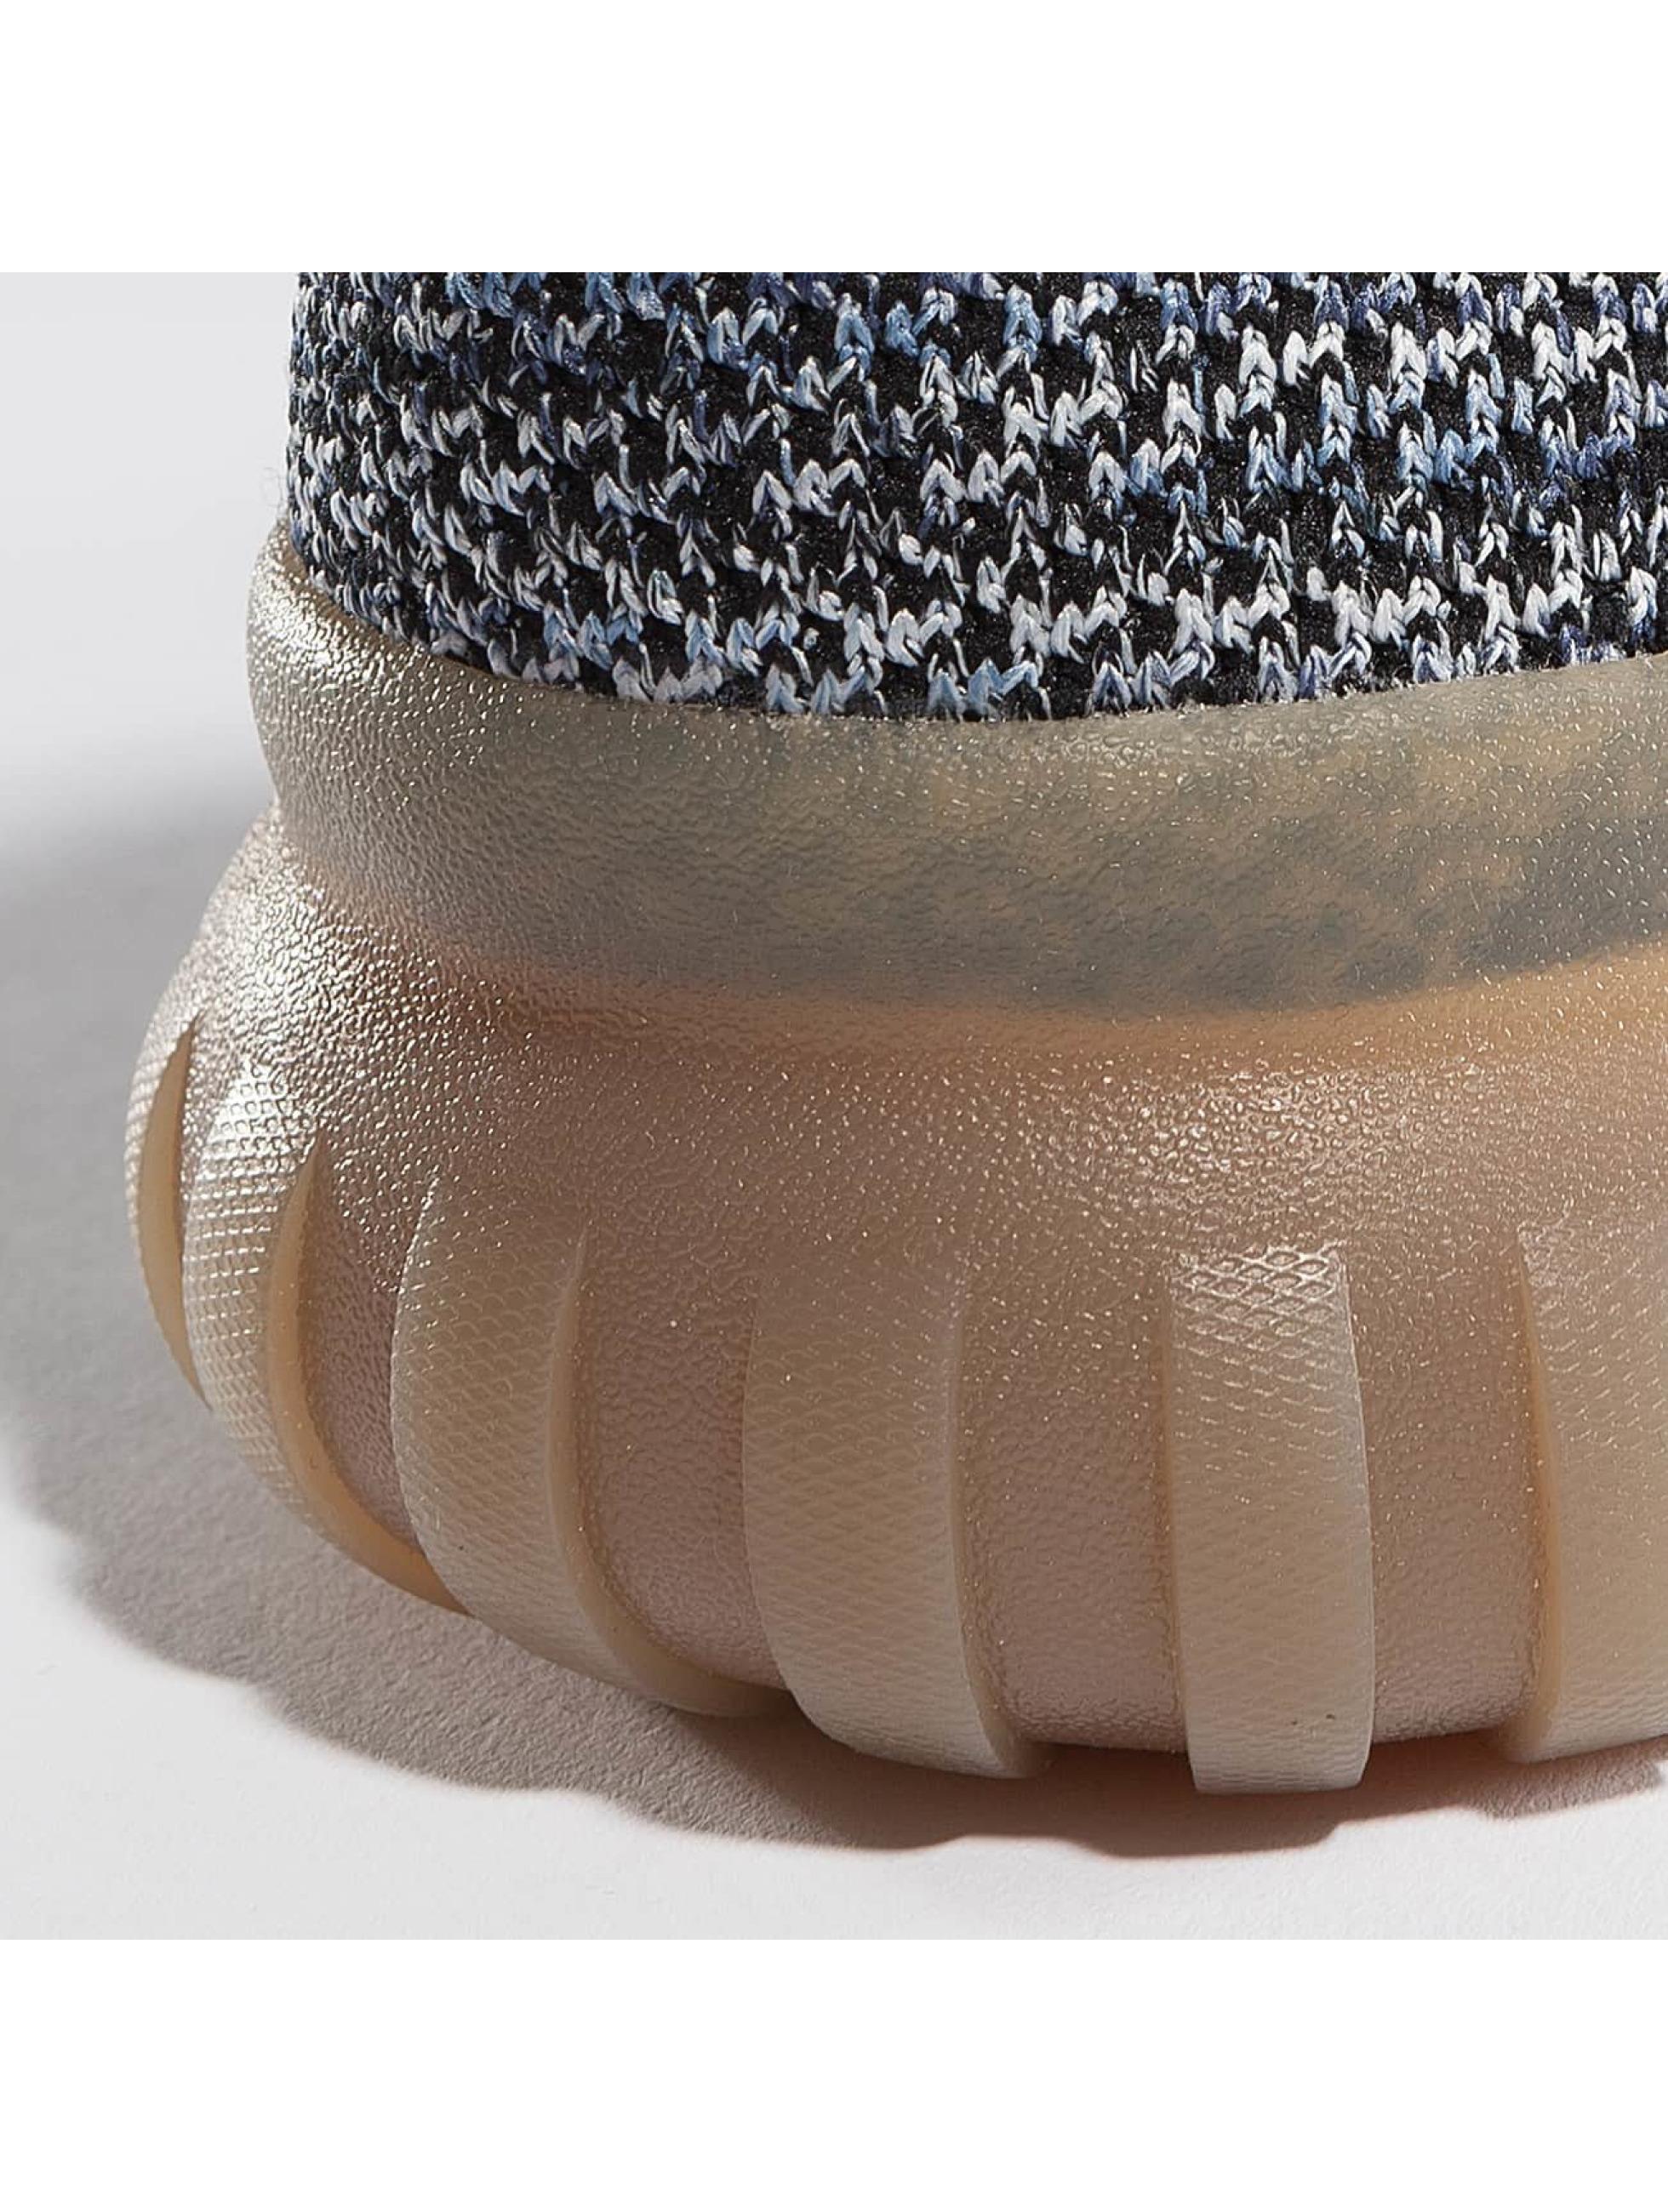 adidas originals Sneakers Tubular X PK black